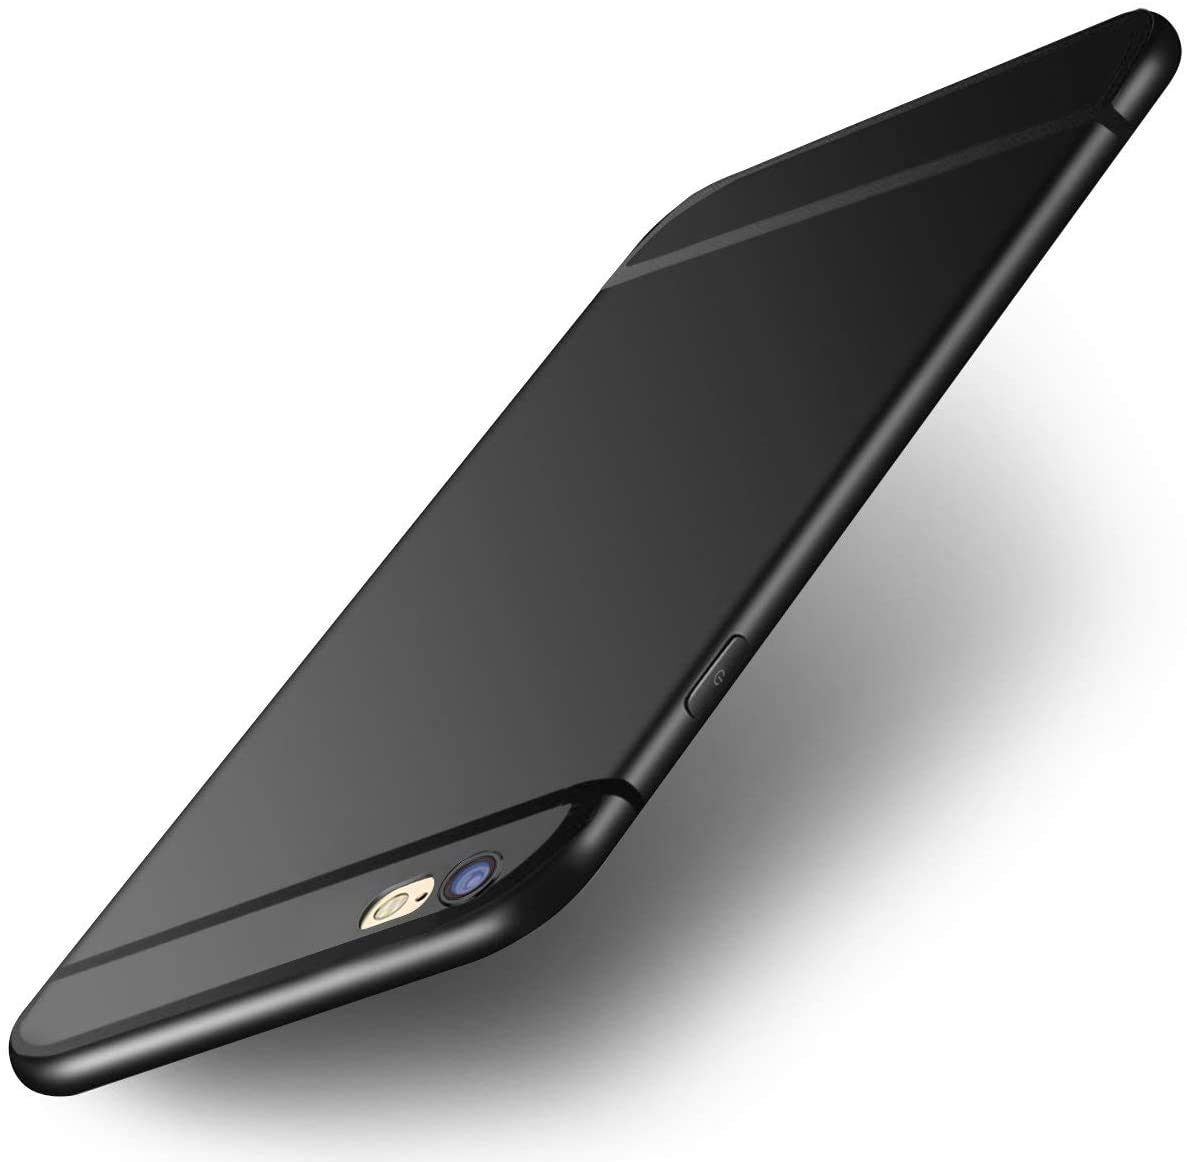 UBEGOOD Funda iPhone 6s, iPhone 6 Caso, Carcasa iPhone 6s TPU Funda Anti-Rasguño Anti-Golpes Ultra Slim Cover Protectora TPU Bumper Silicona Case para iPhone 6s / iPhone 6 Protectora Funda: Amazon.es: Electrónica